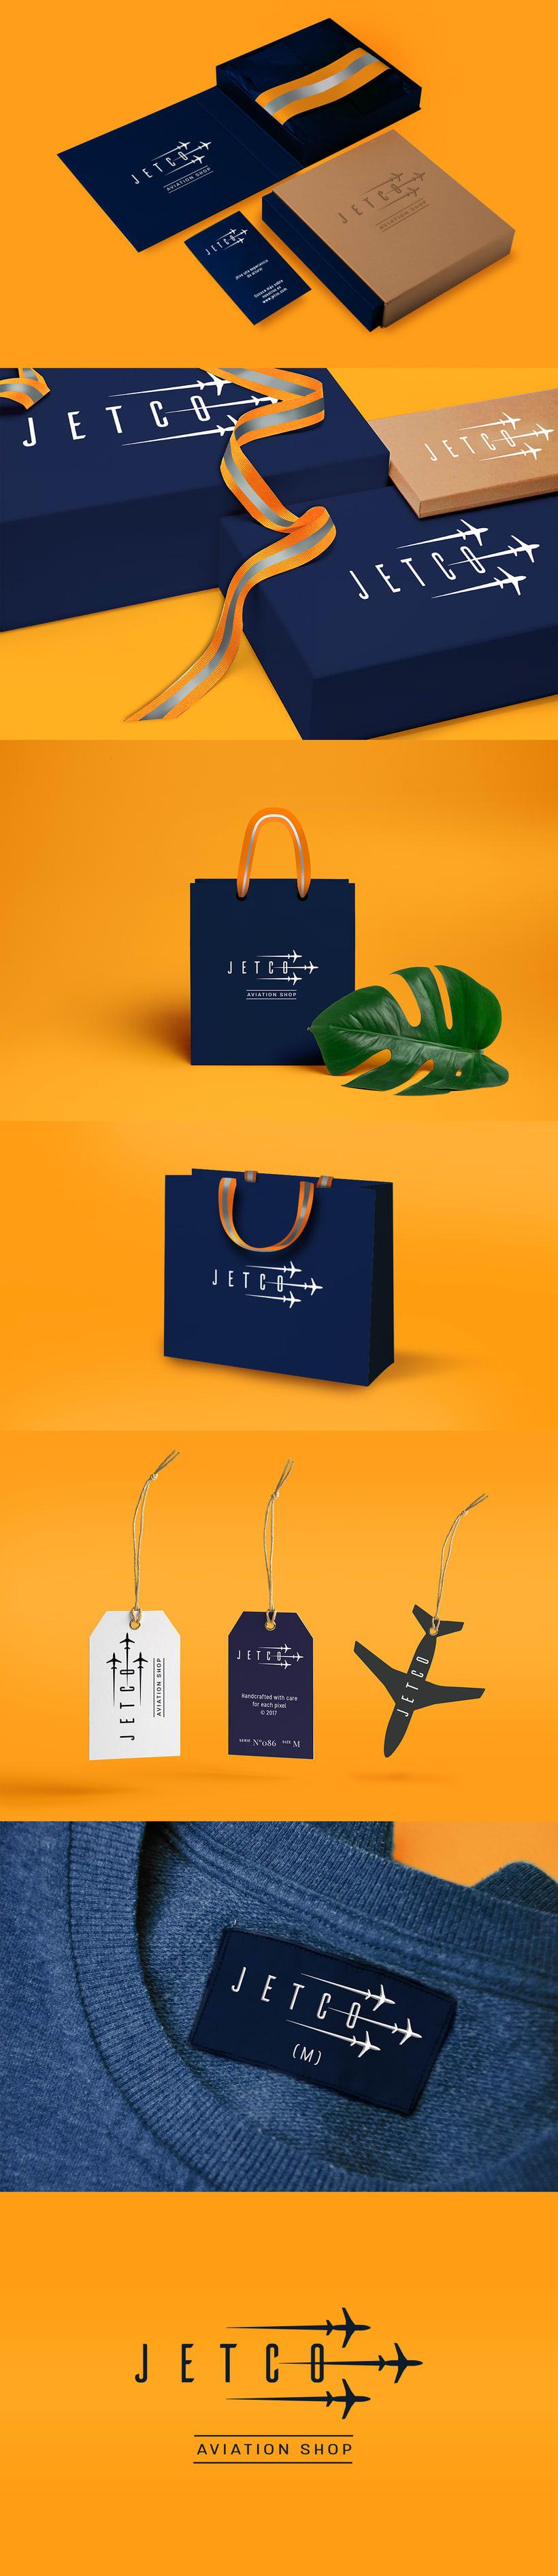 Jetco: Packaging Design (Diseño de empaques) -1